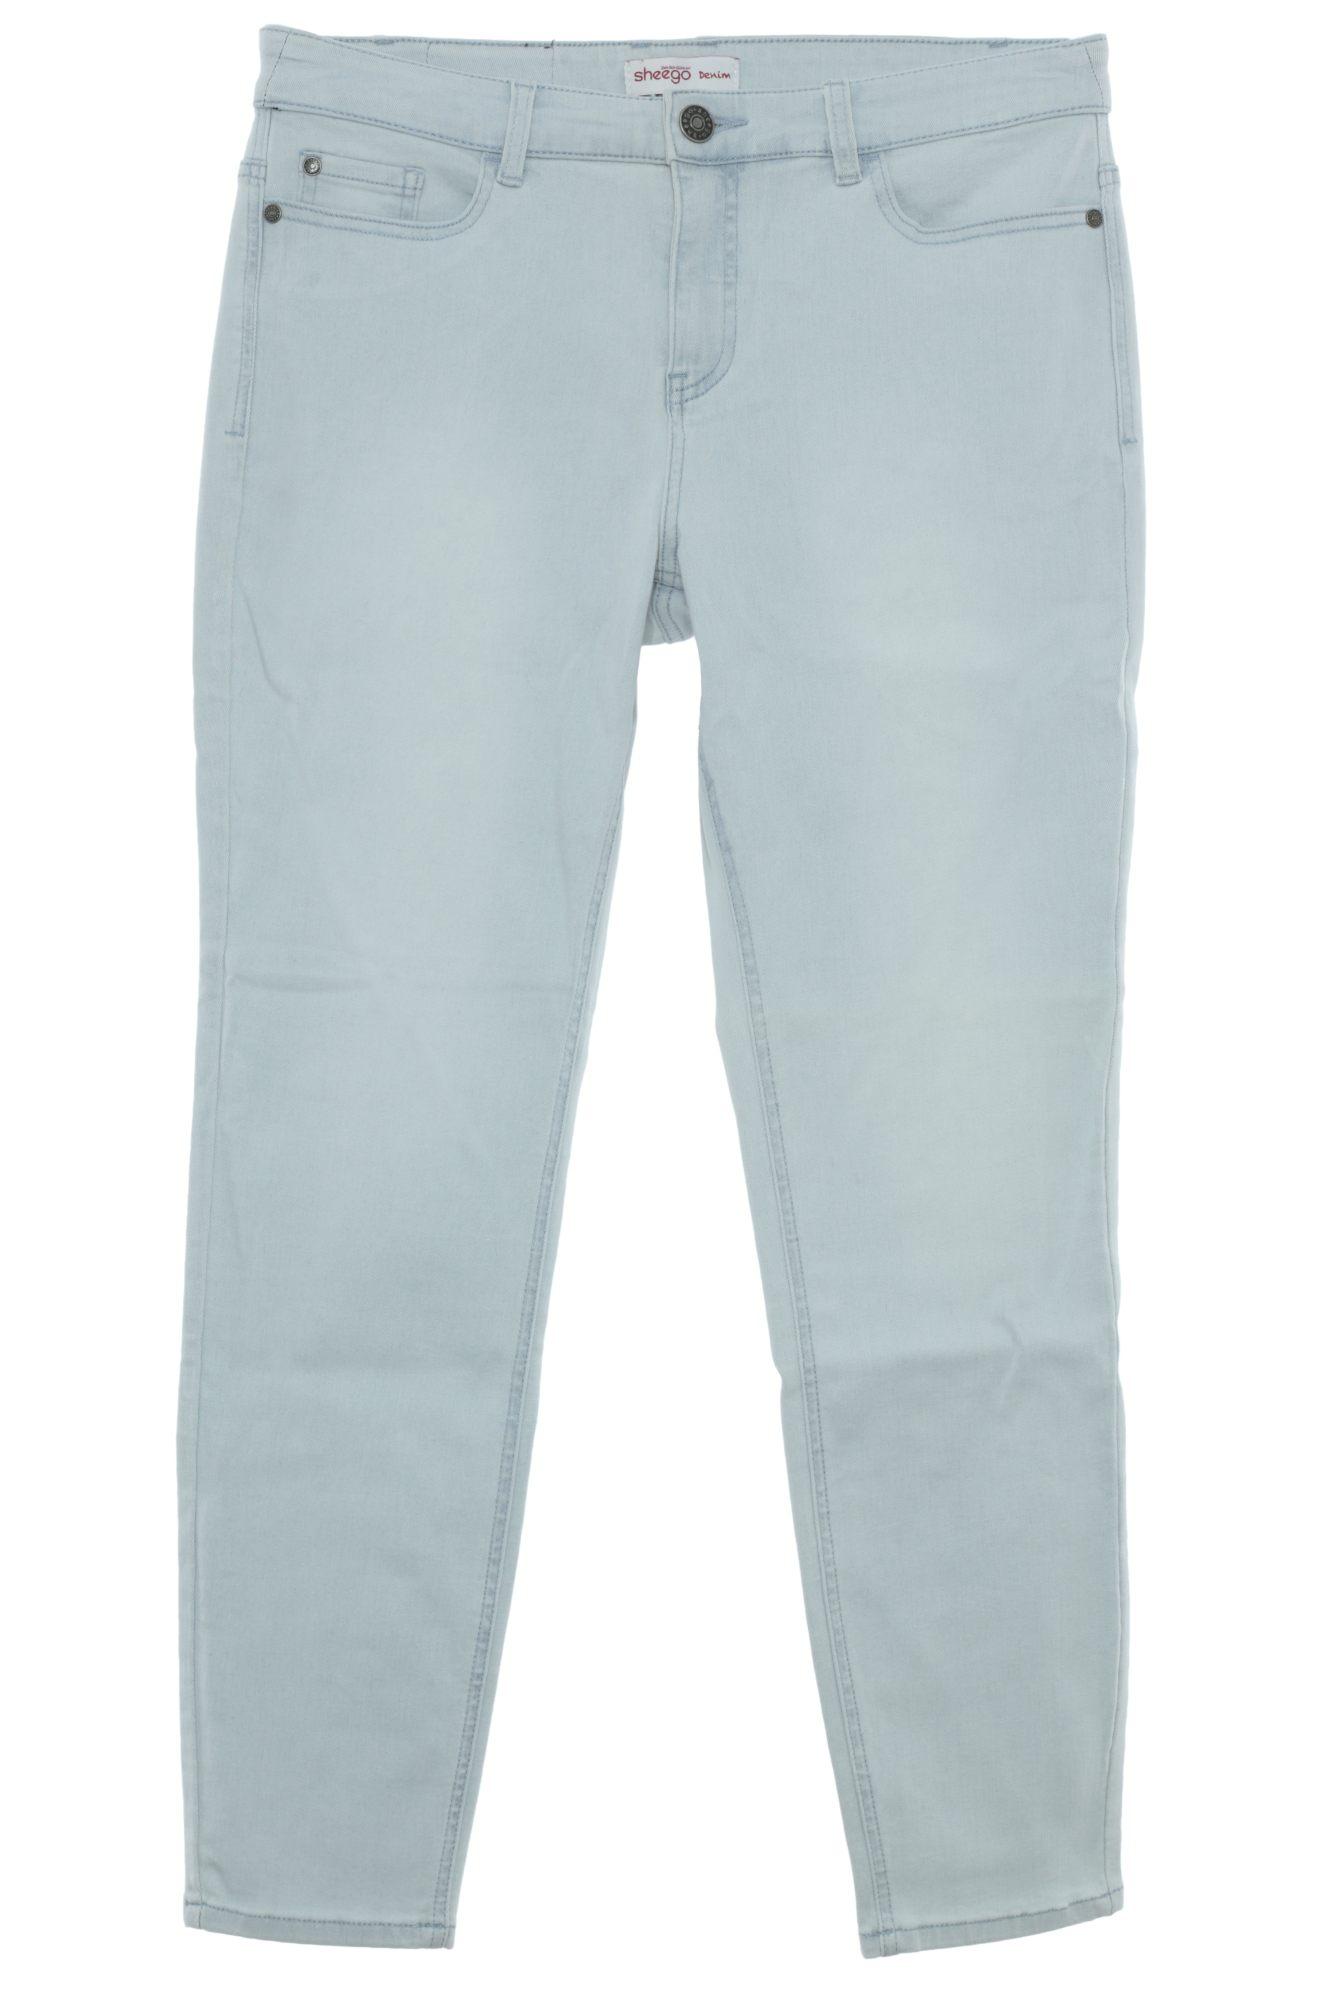 sheego Jeans Damen Stretch Plusgröße